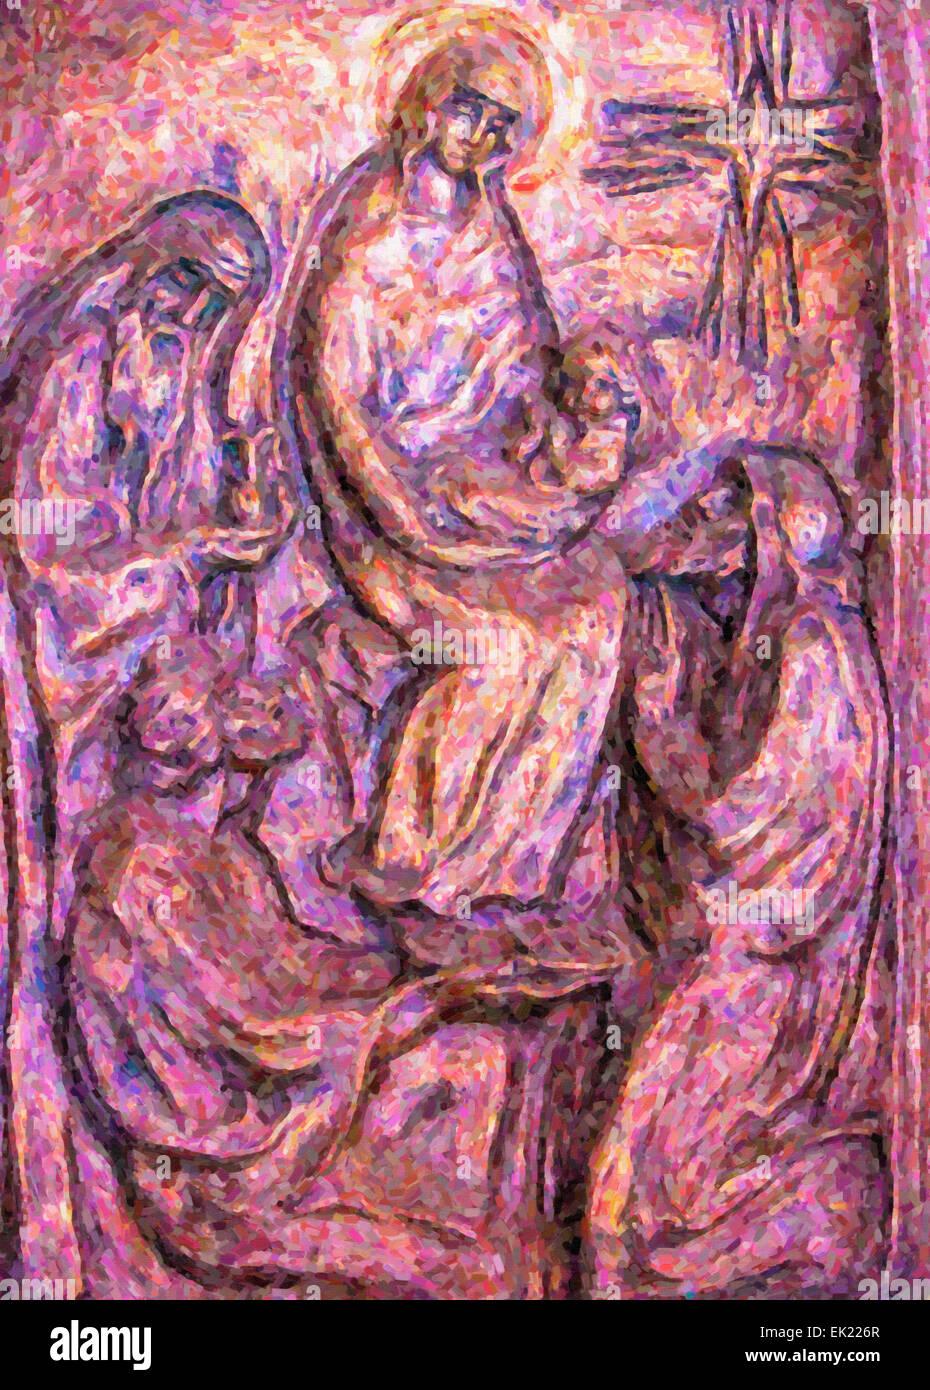 Birth Of Jesus Christ Stock Photos & Birth Of Jesus Christ Stock ...